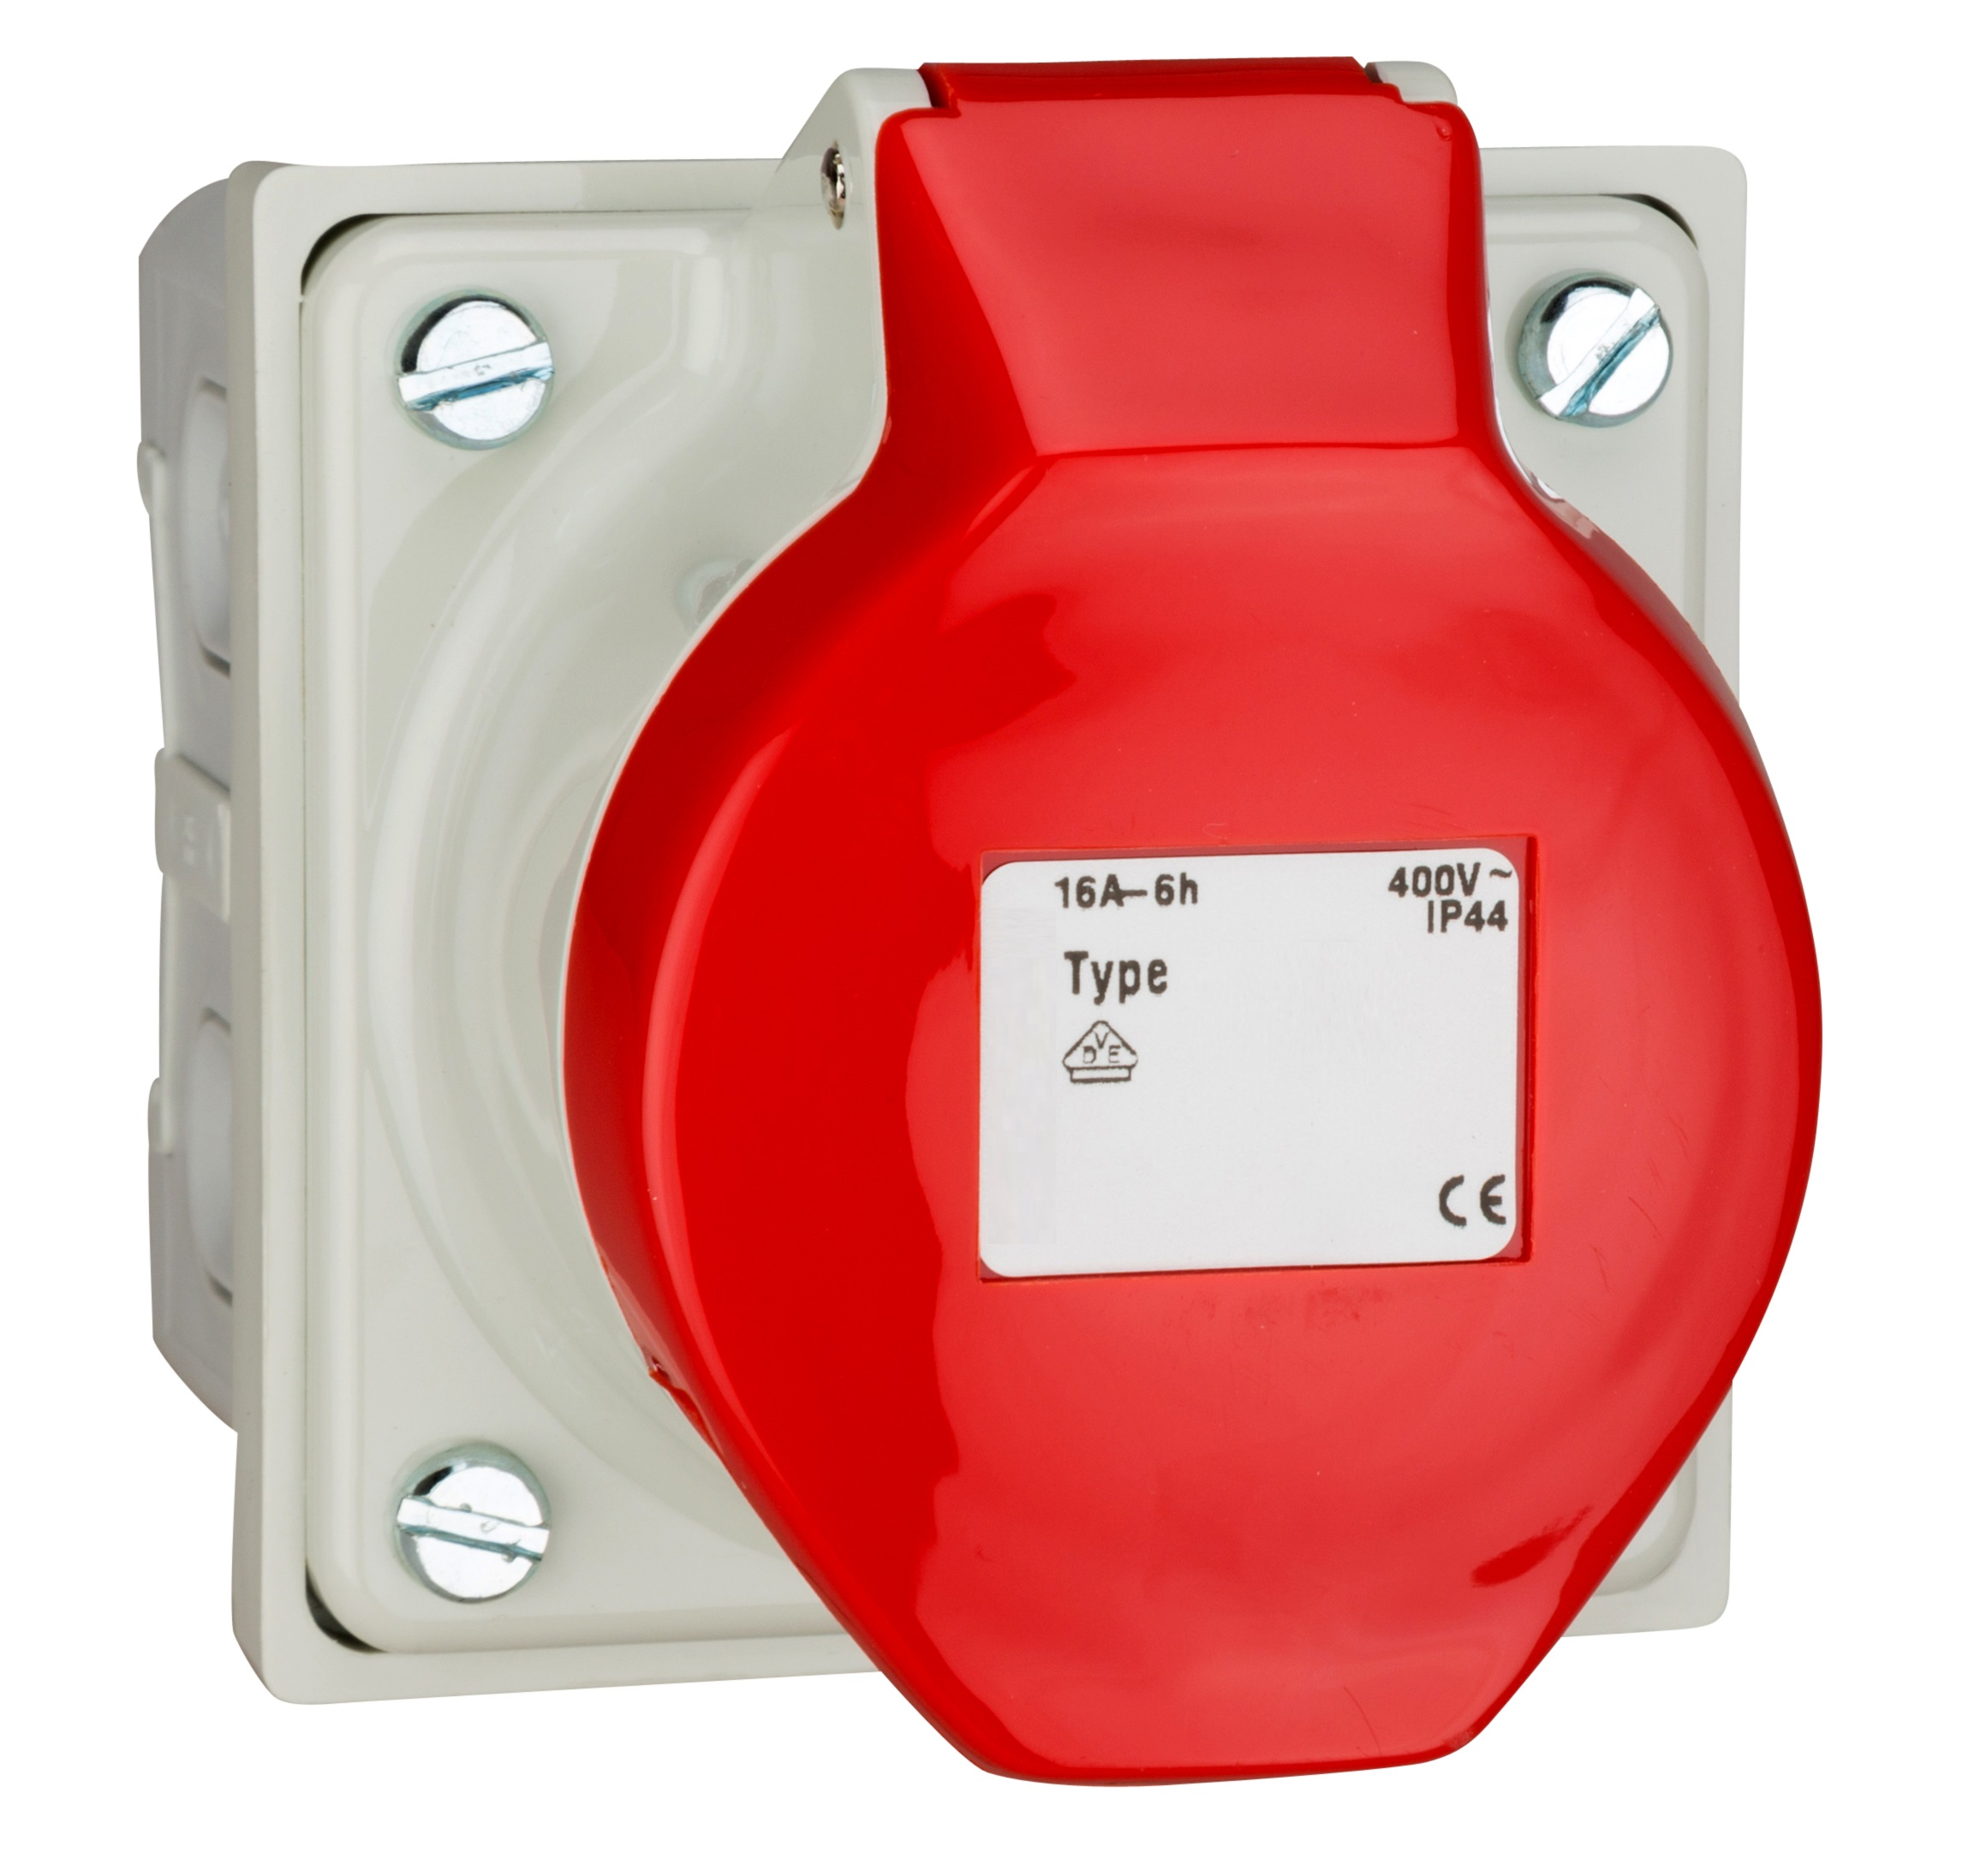 1 Stk CEE-Verteilereinbaudose 5x16A 400V IP44 YY494518--